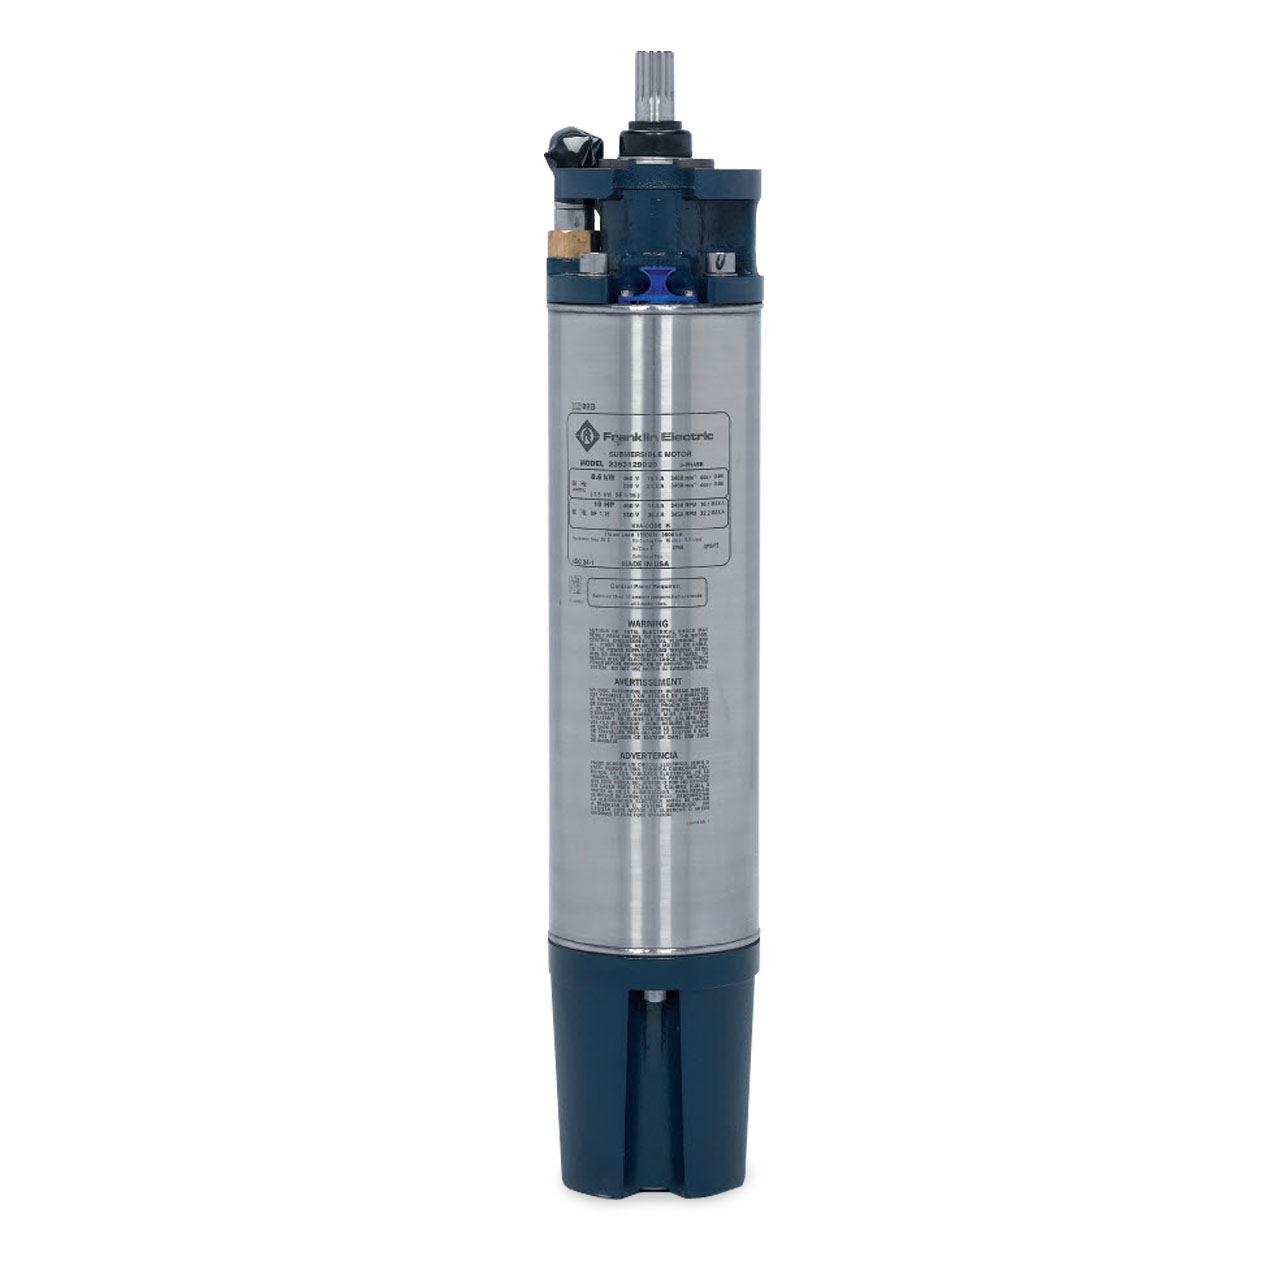 duplex pump control panel wiring diagram duplex pump